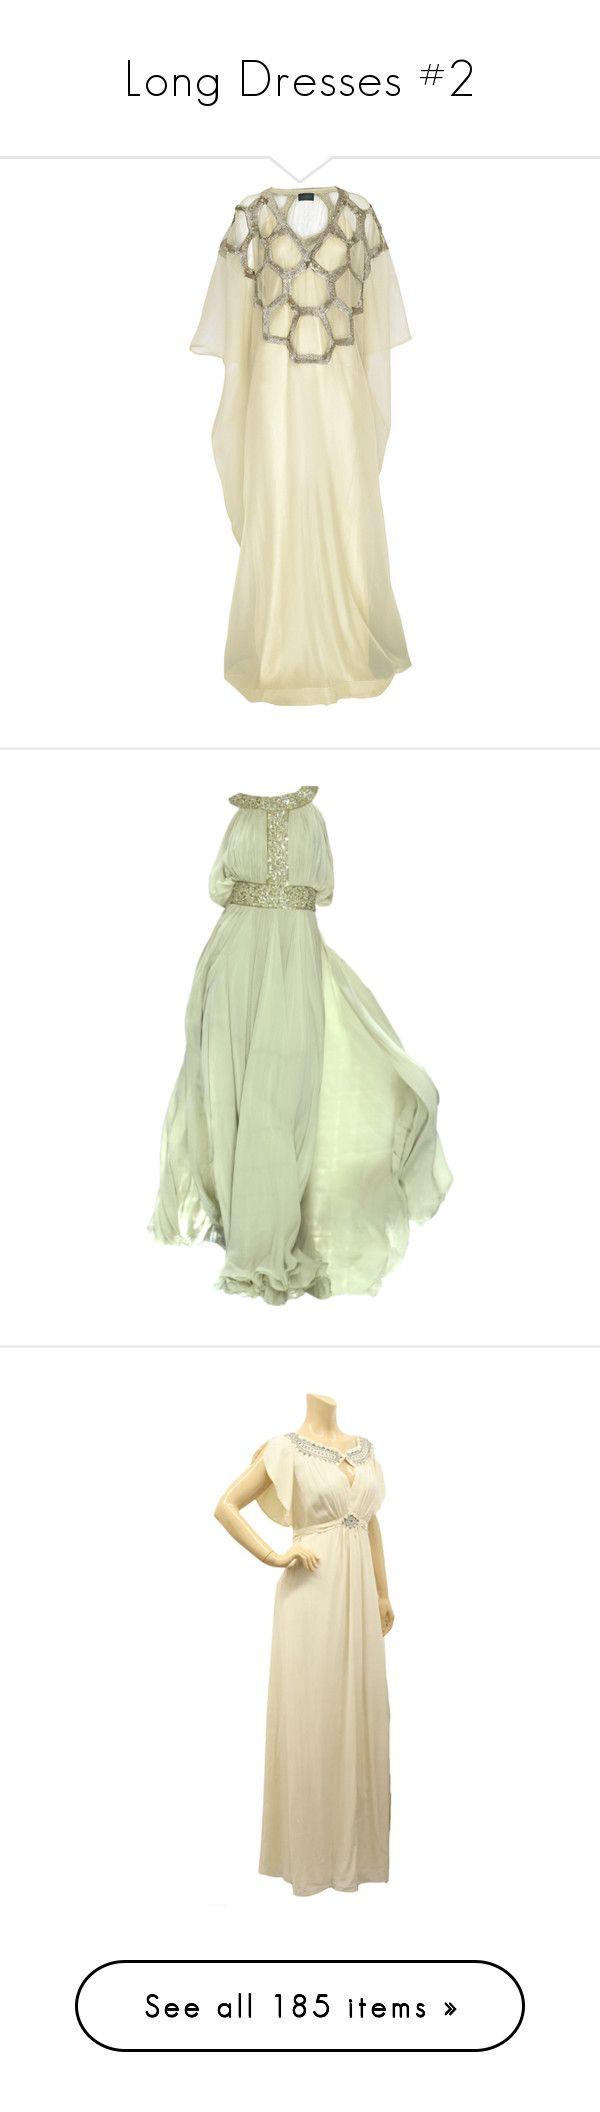 """Long Dresses #2"" by maarij ❤ liked on Polyvore featuring dresses, gowns, long dresses, halston, women, full length slip, beige long dress, long floral dresses, long kaftan dress and sequin dress"